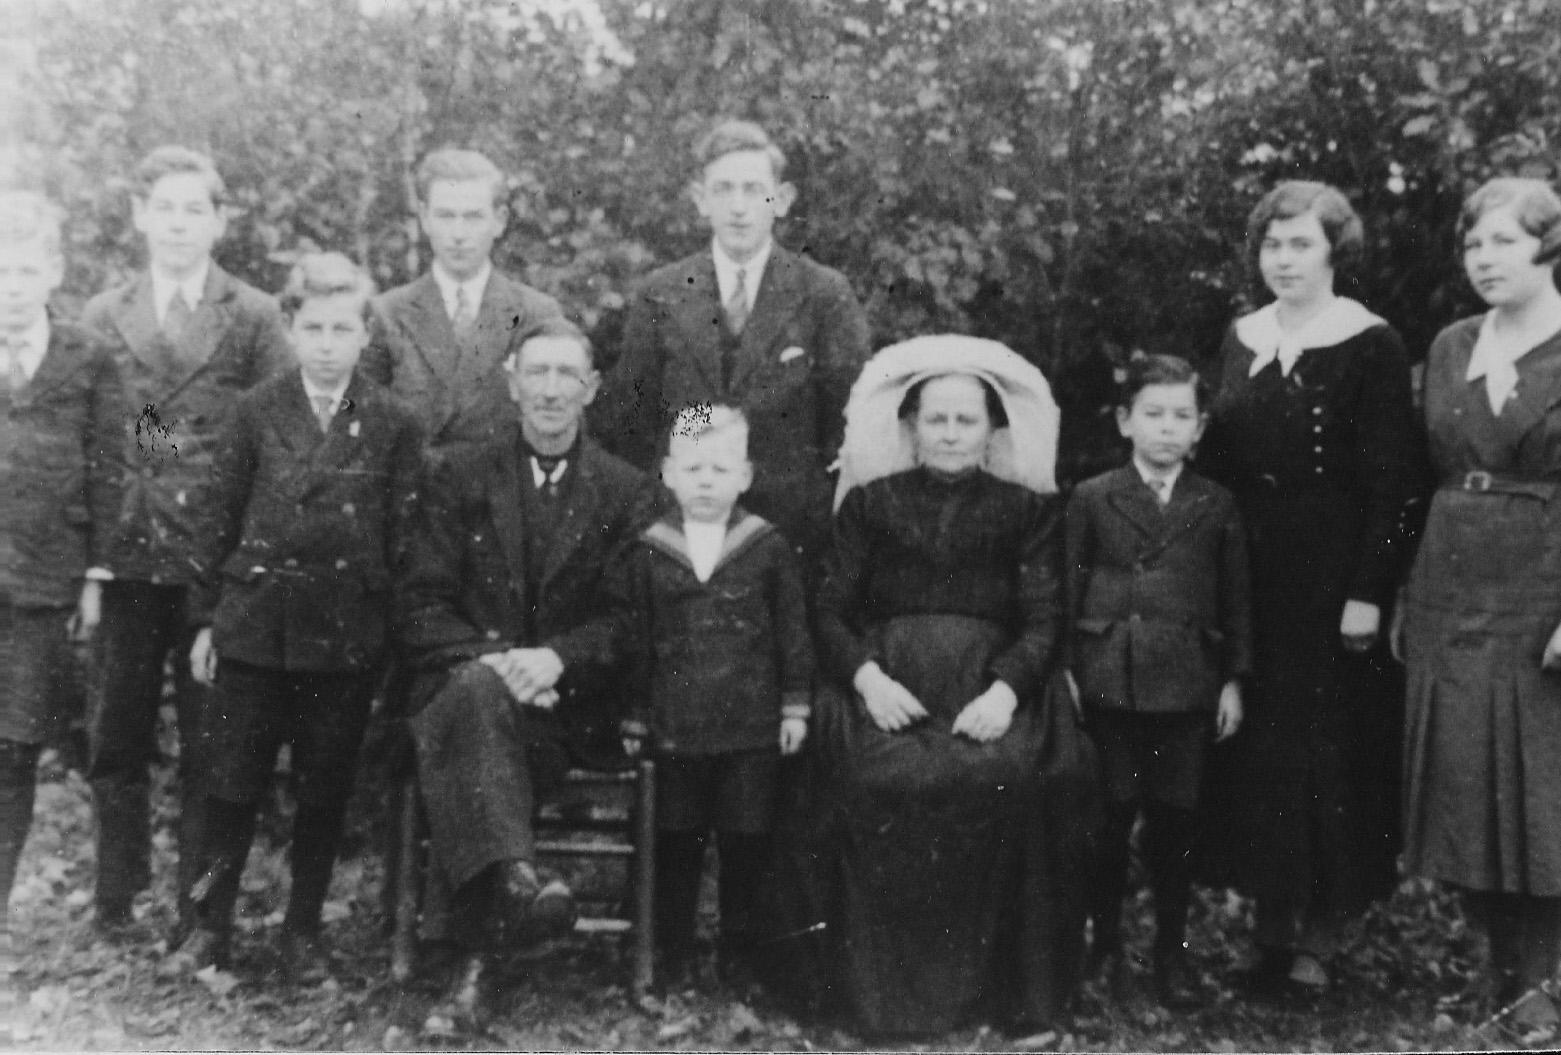 ca1925 Fam Christ Schellekens en Martina Langenhuijzen